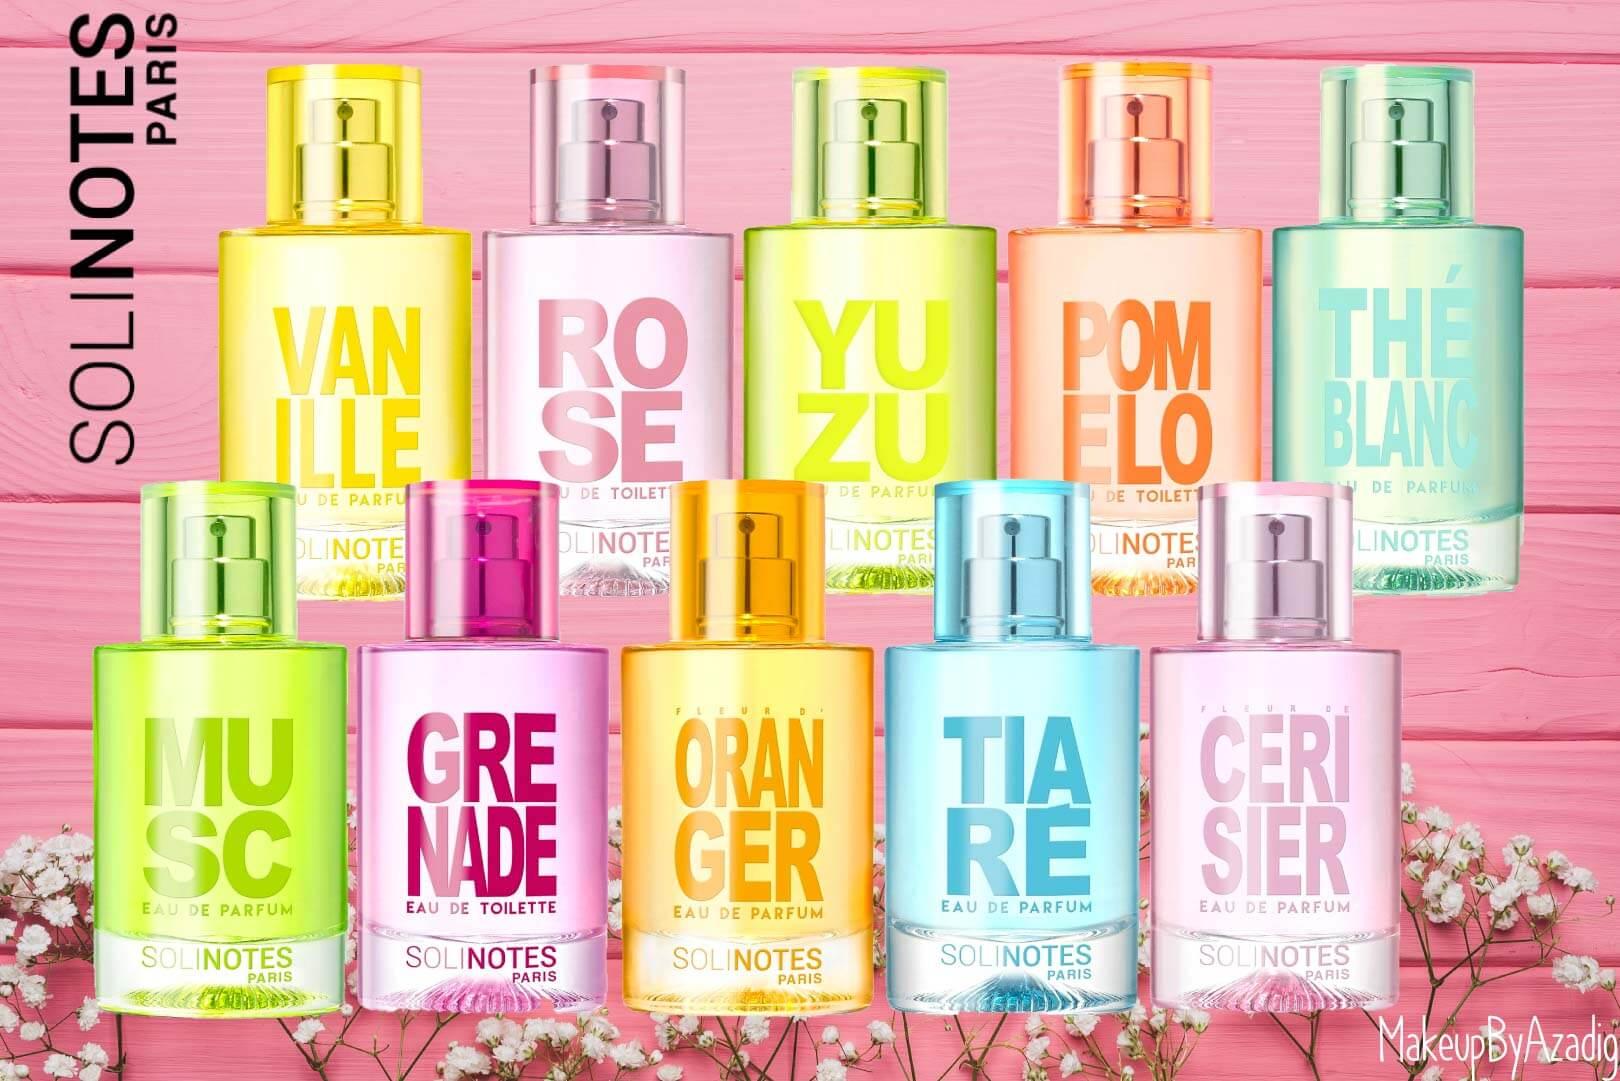 collection-revue-parfum-solinotes-sephora-monoprix-the-blanc-vanille-oranger-prix-pas-cher-promo-makeupbyazadig-white